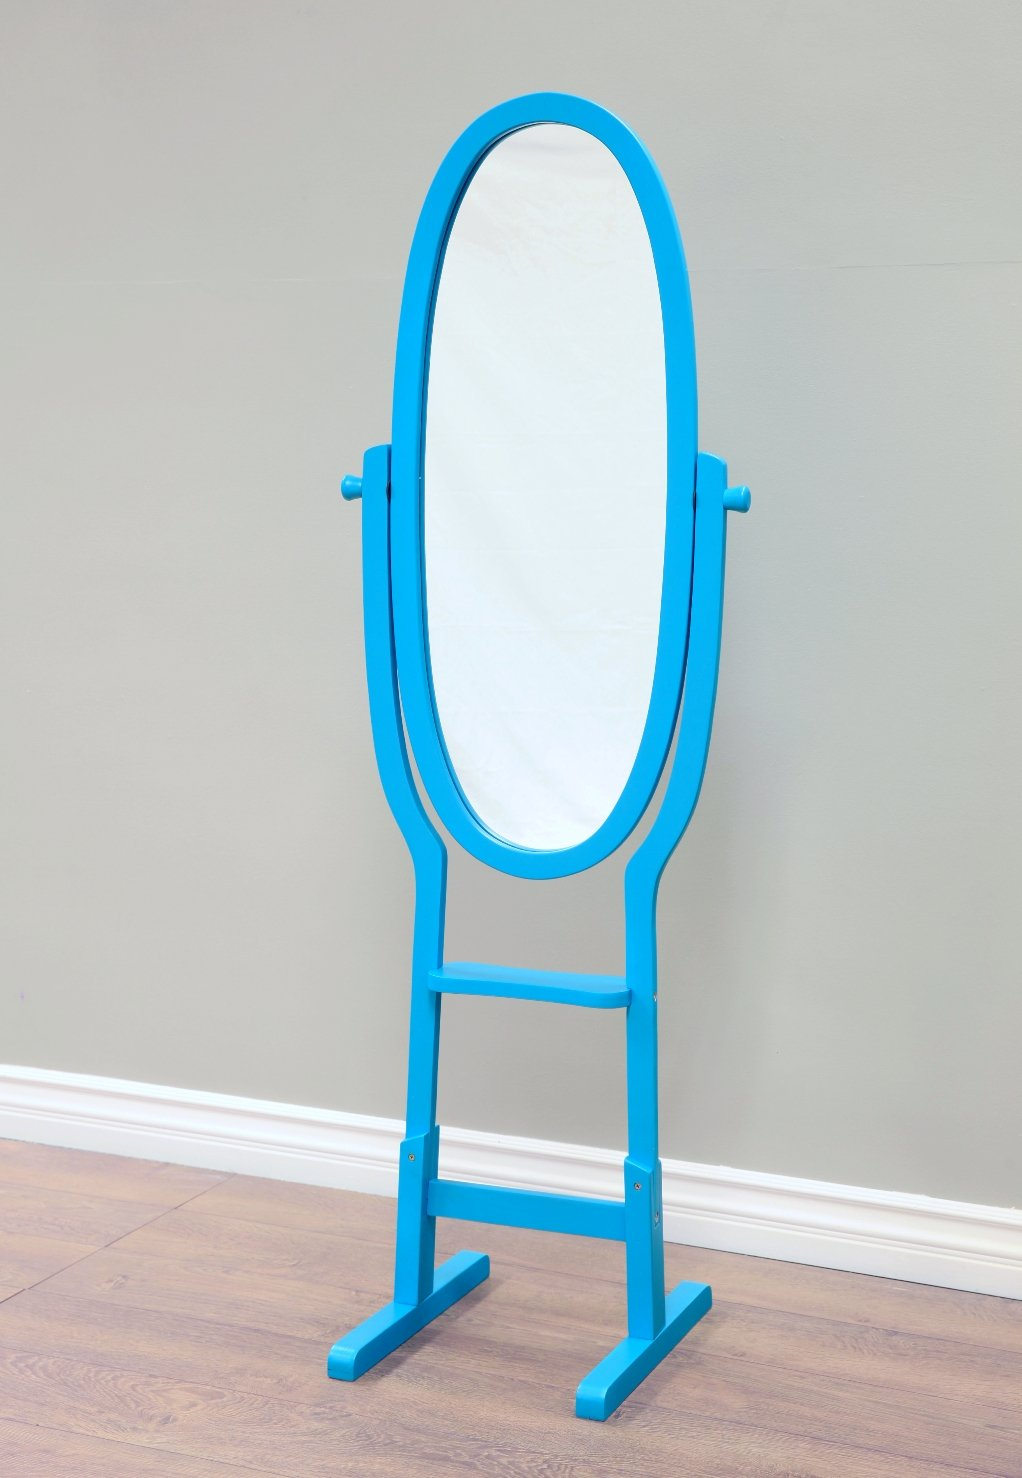 Frenchi Home Furnishing Kids Mirror Stand Blue mega home MR282-BU